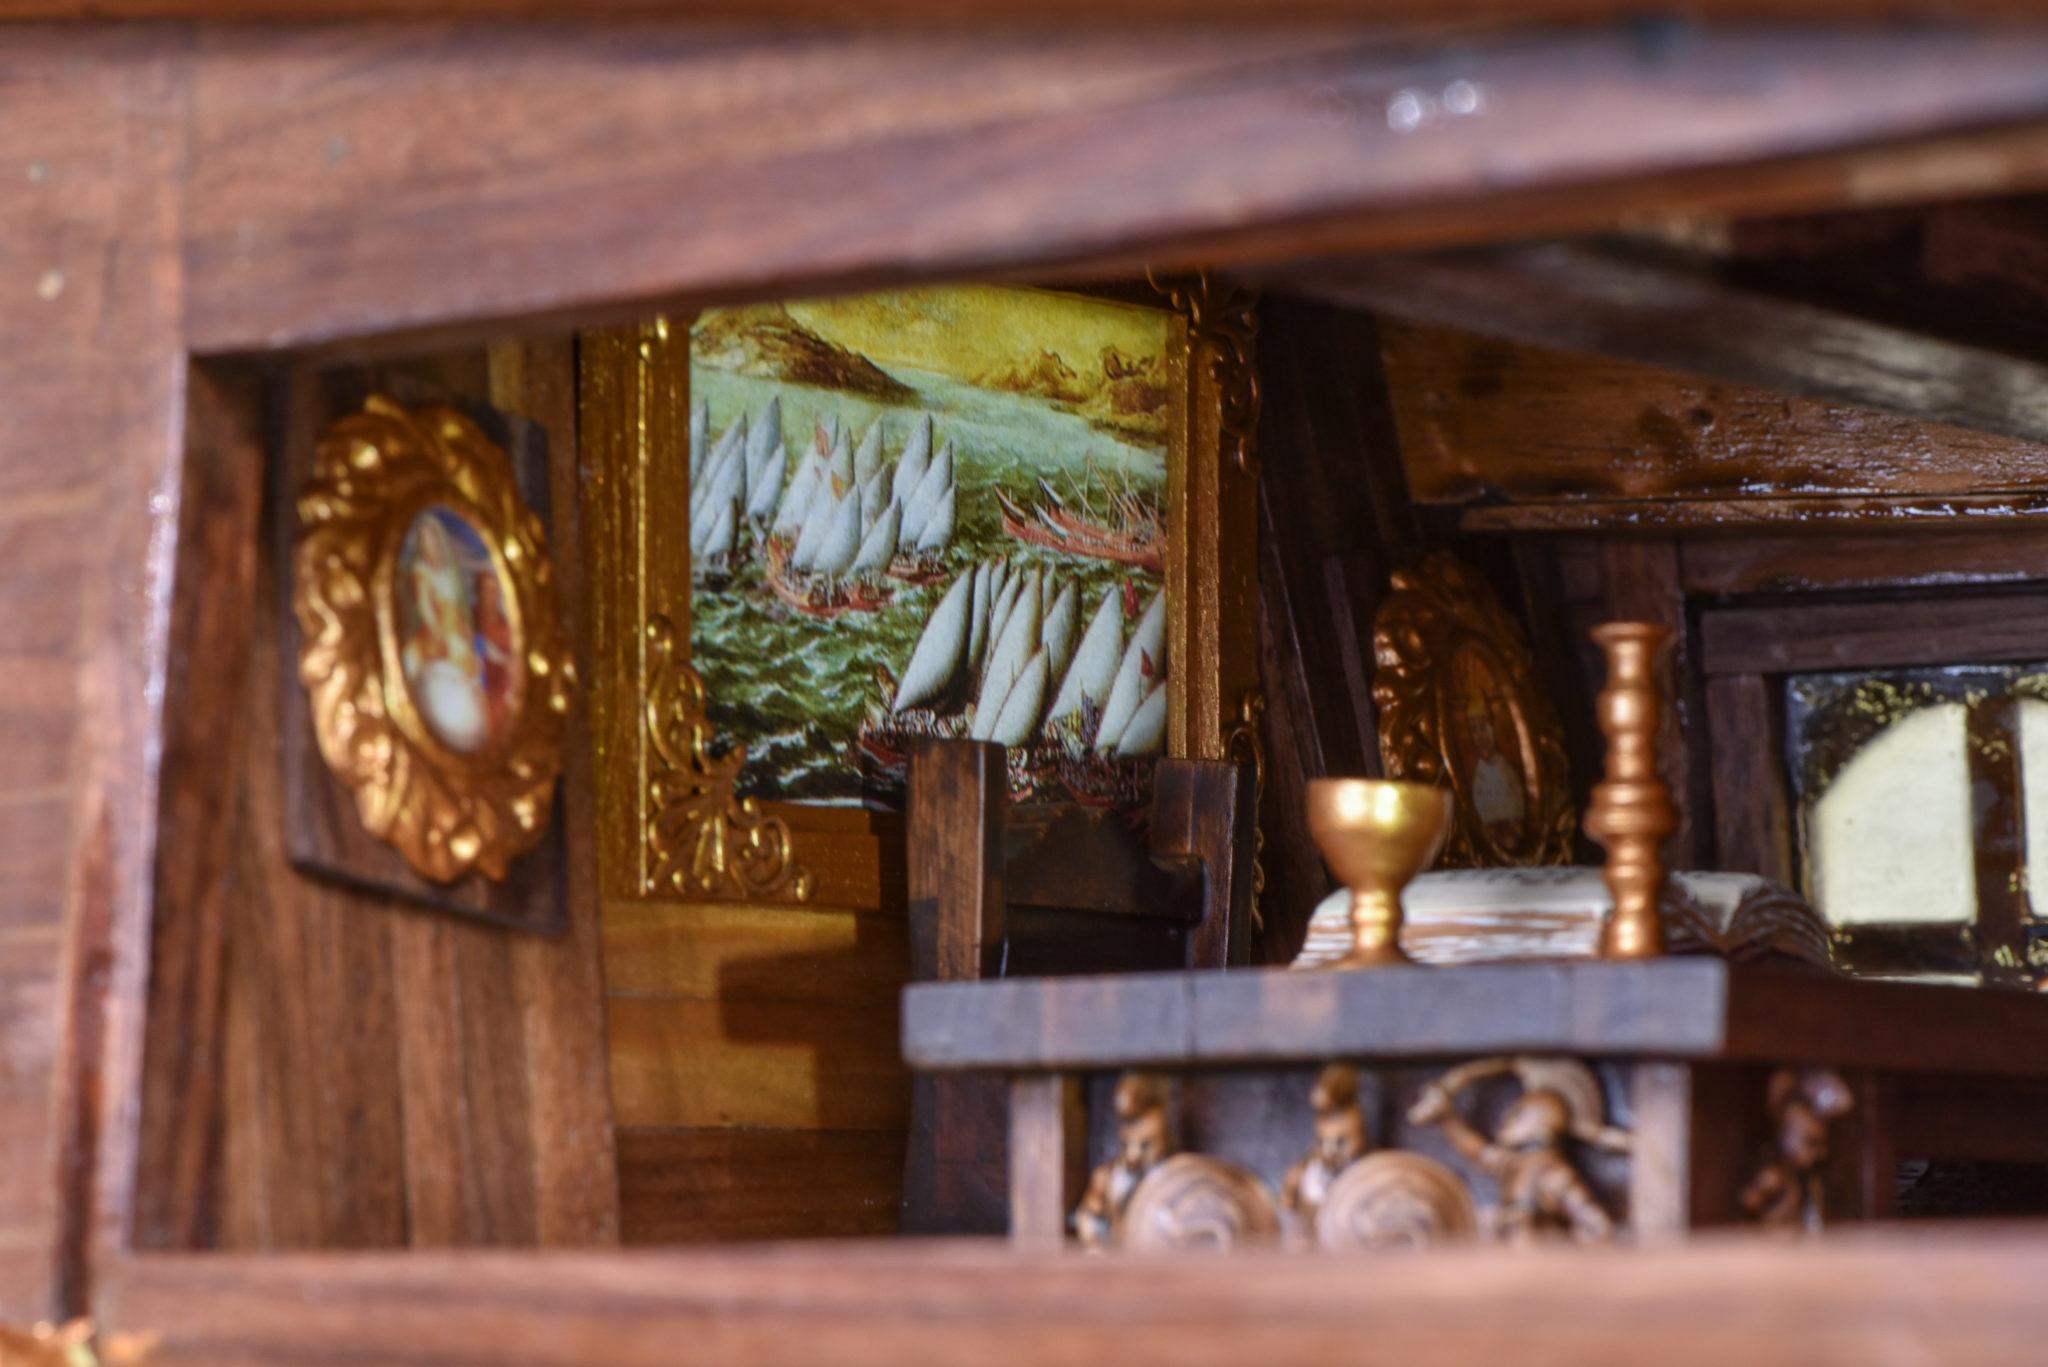 To ξυλόγλυπτο γραφείο του Κυβερνήτη με το ημερολόγιο του πλοίου, η πολυθρόνα του και πίνακες που κοσμούν το γραφείο.